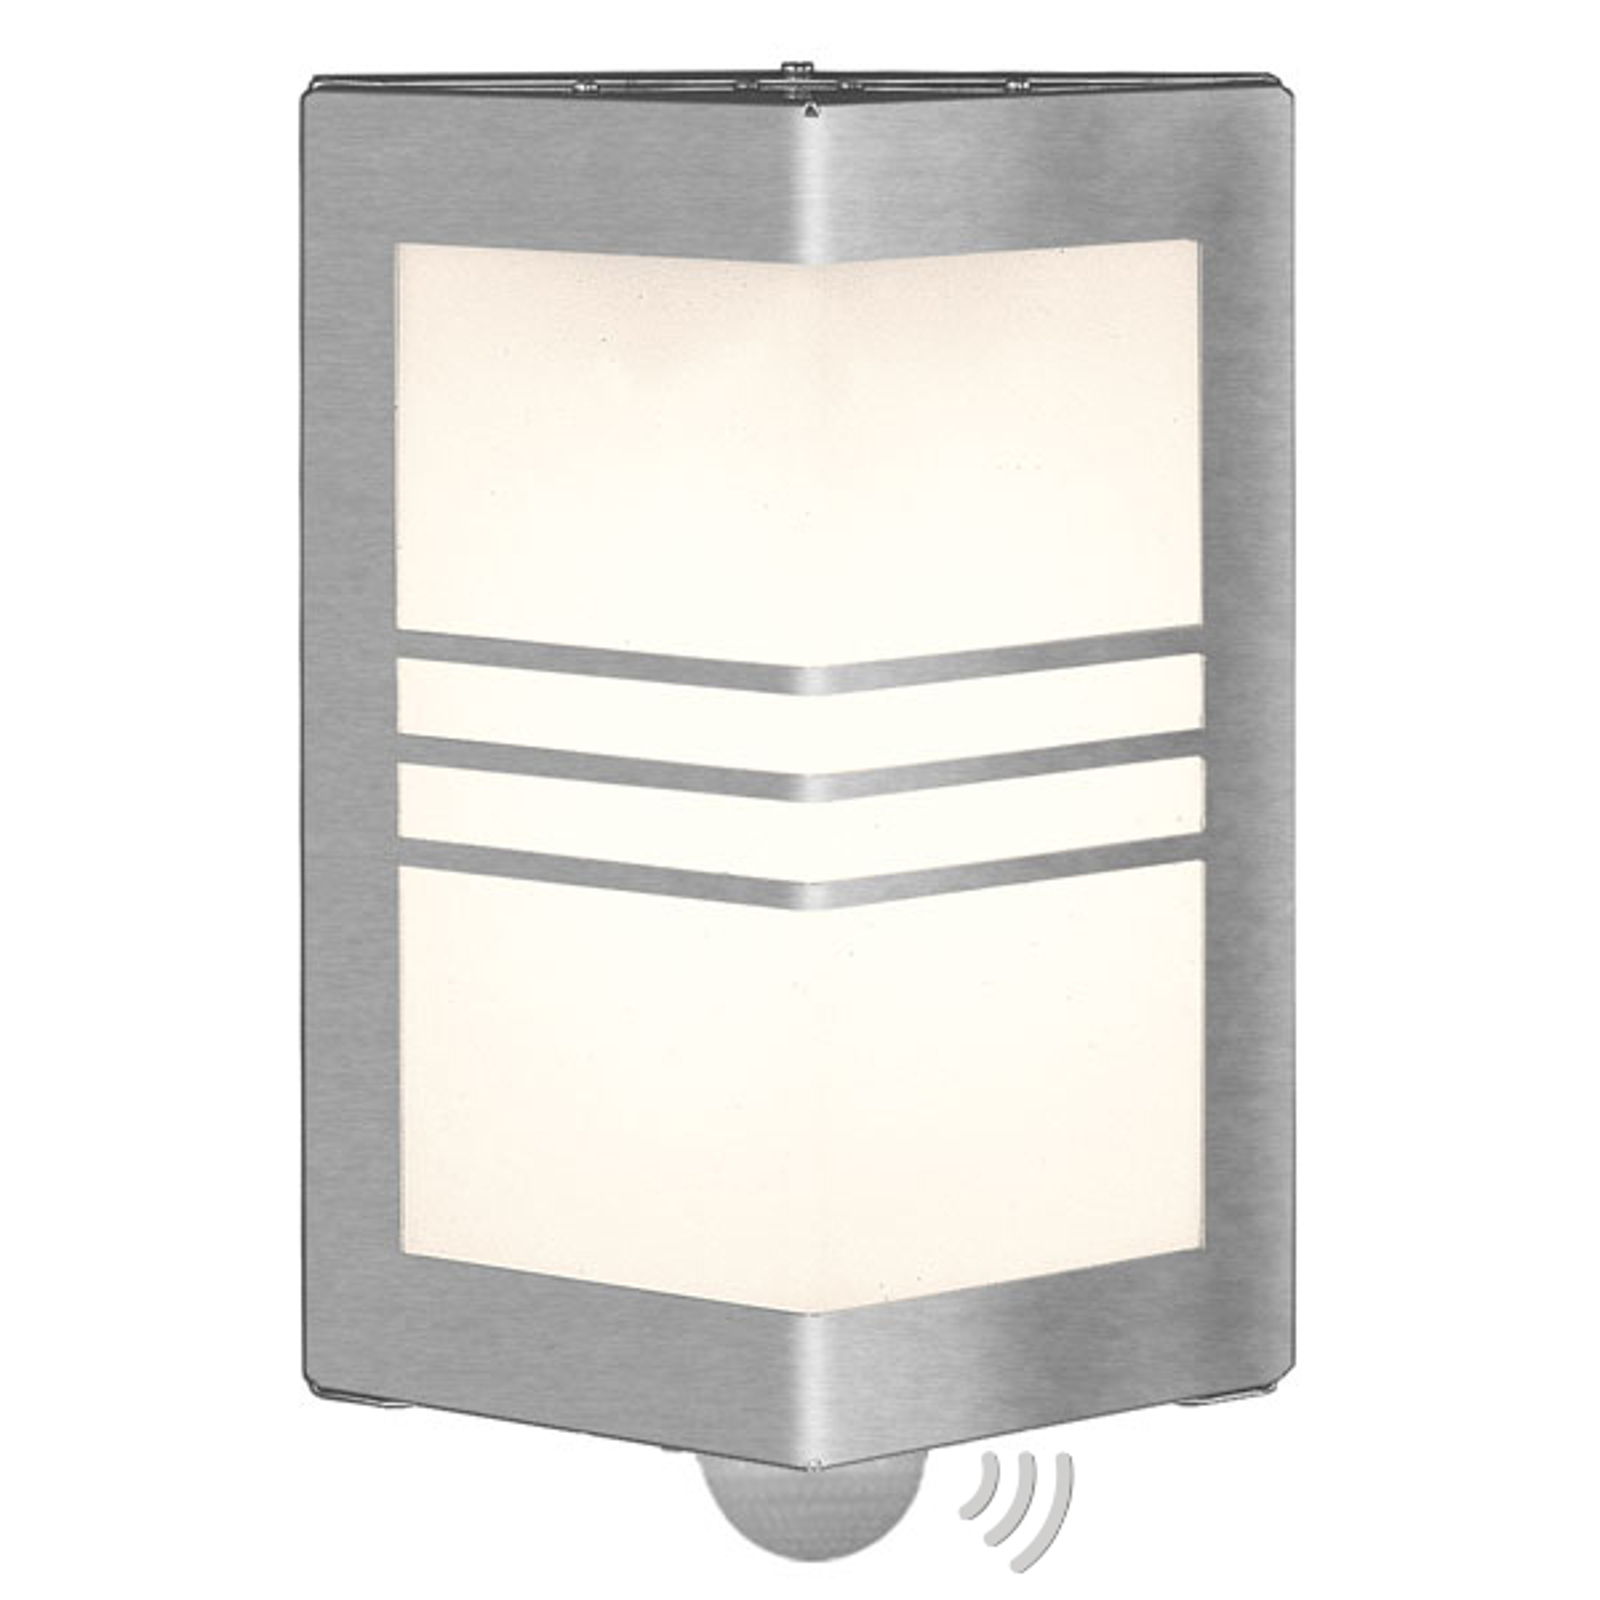 Wandlamp MEDI met bewegingssensor